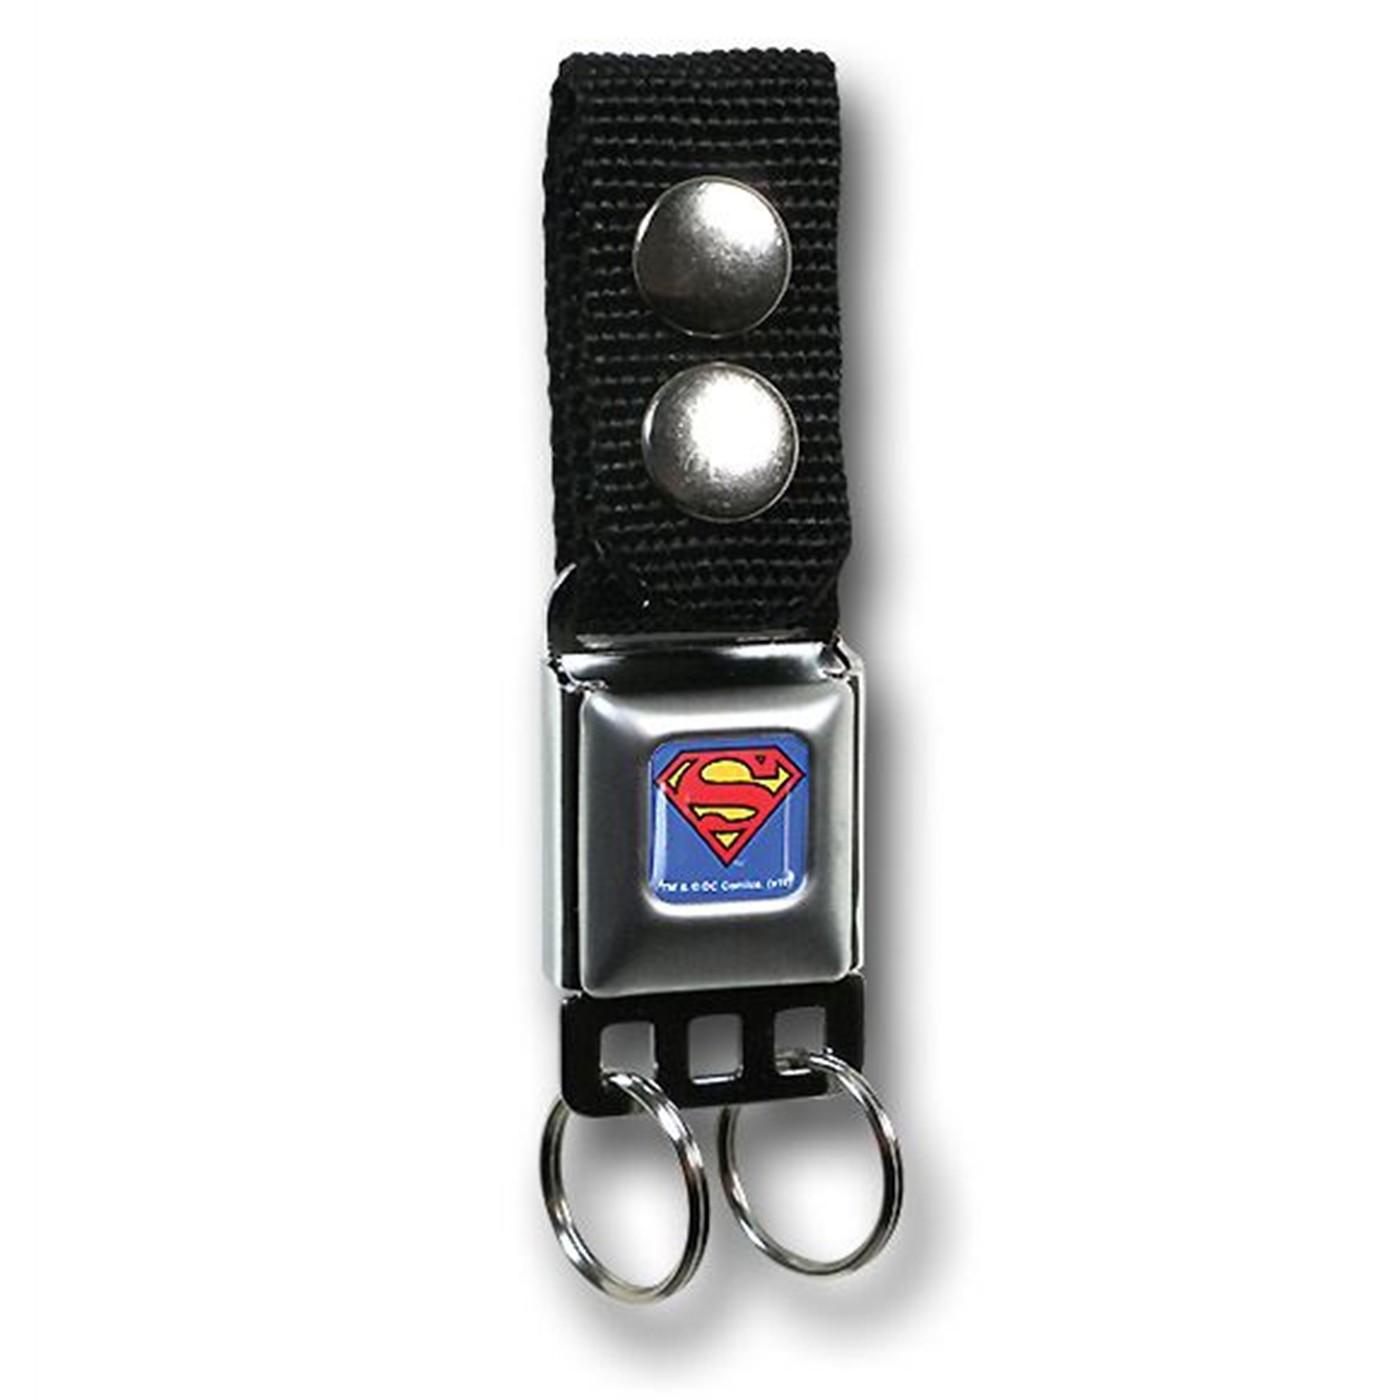 Superman Seatbelt Keychain w/Snap-On Belt Loop